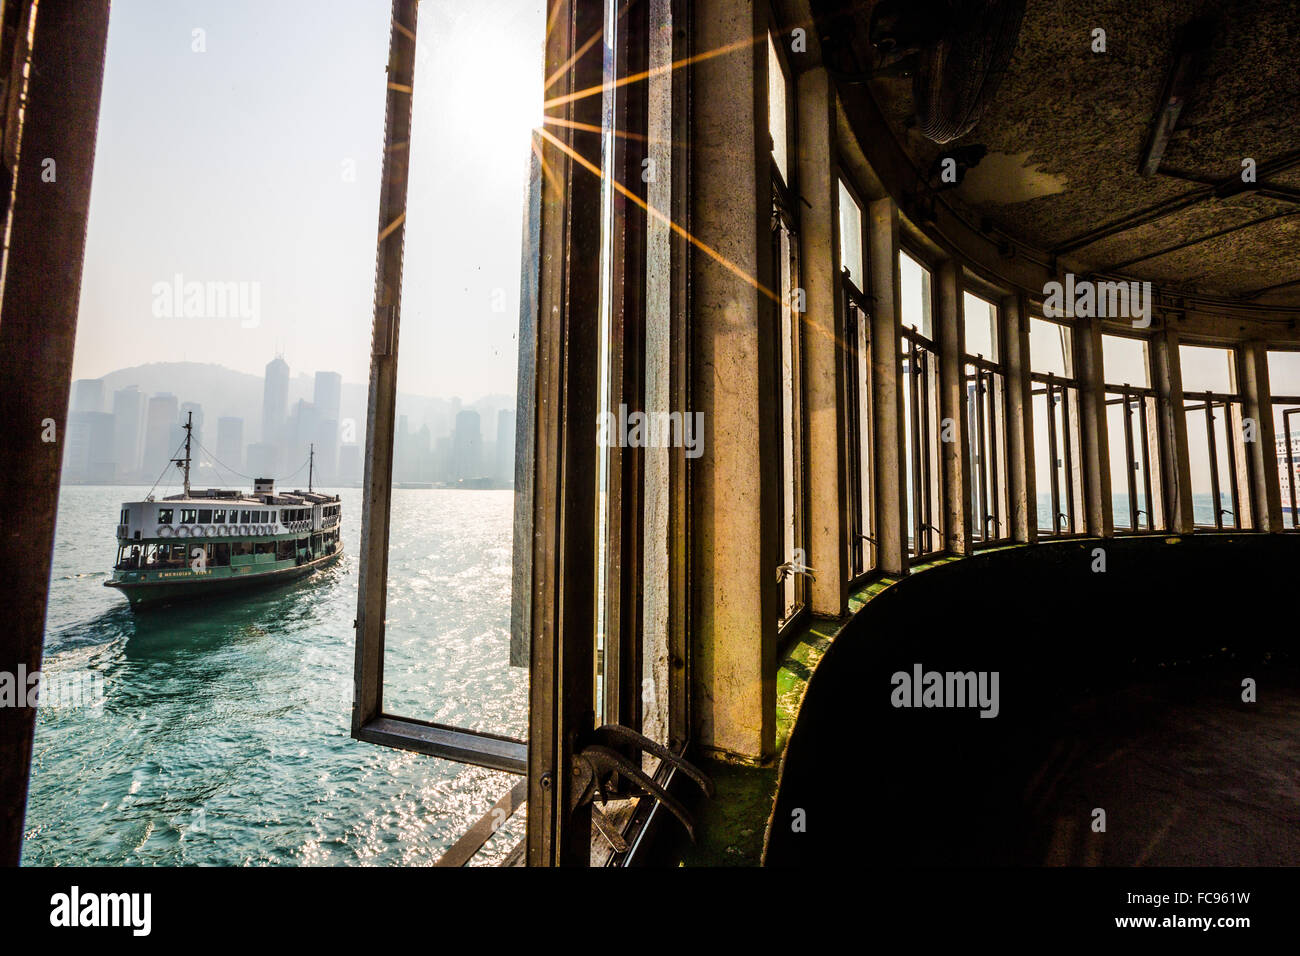 Star Ferry, Tsim Sha Tsui, Hong Kong, China, Asia - Stock Image